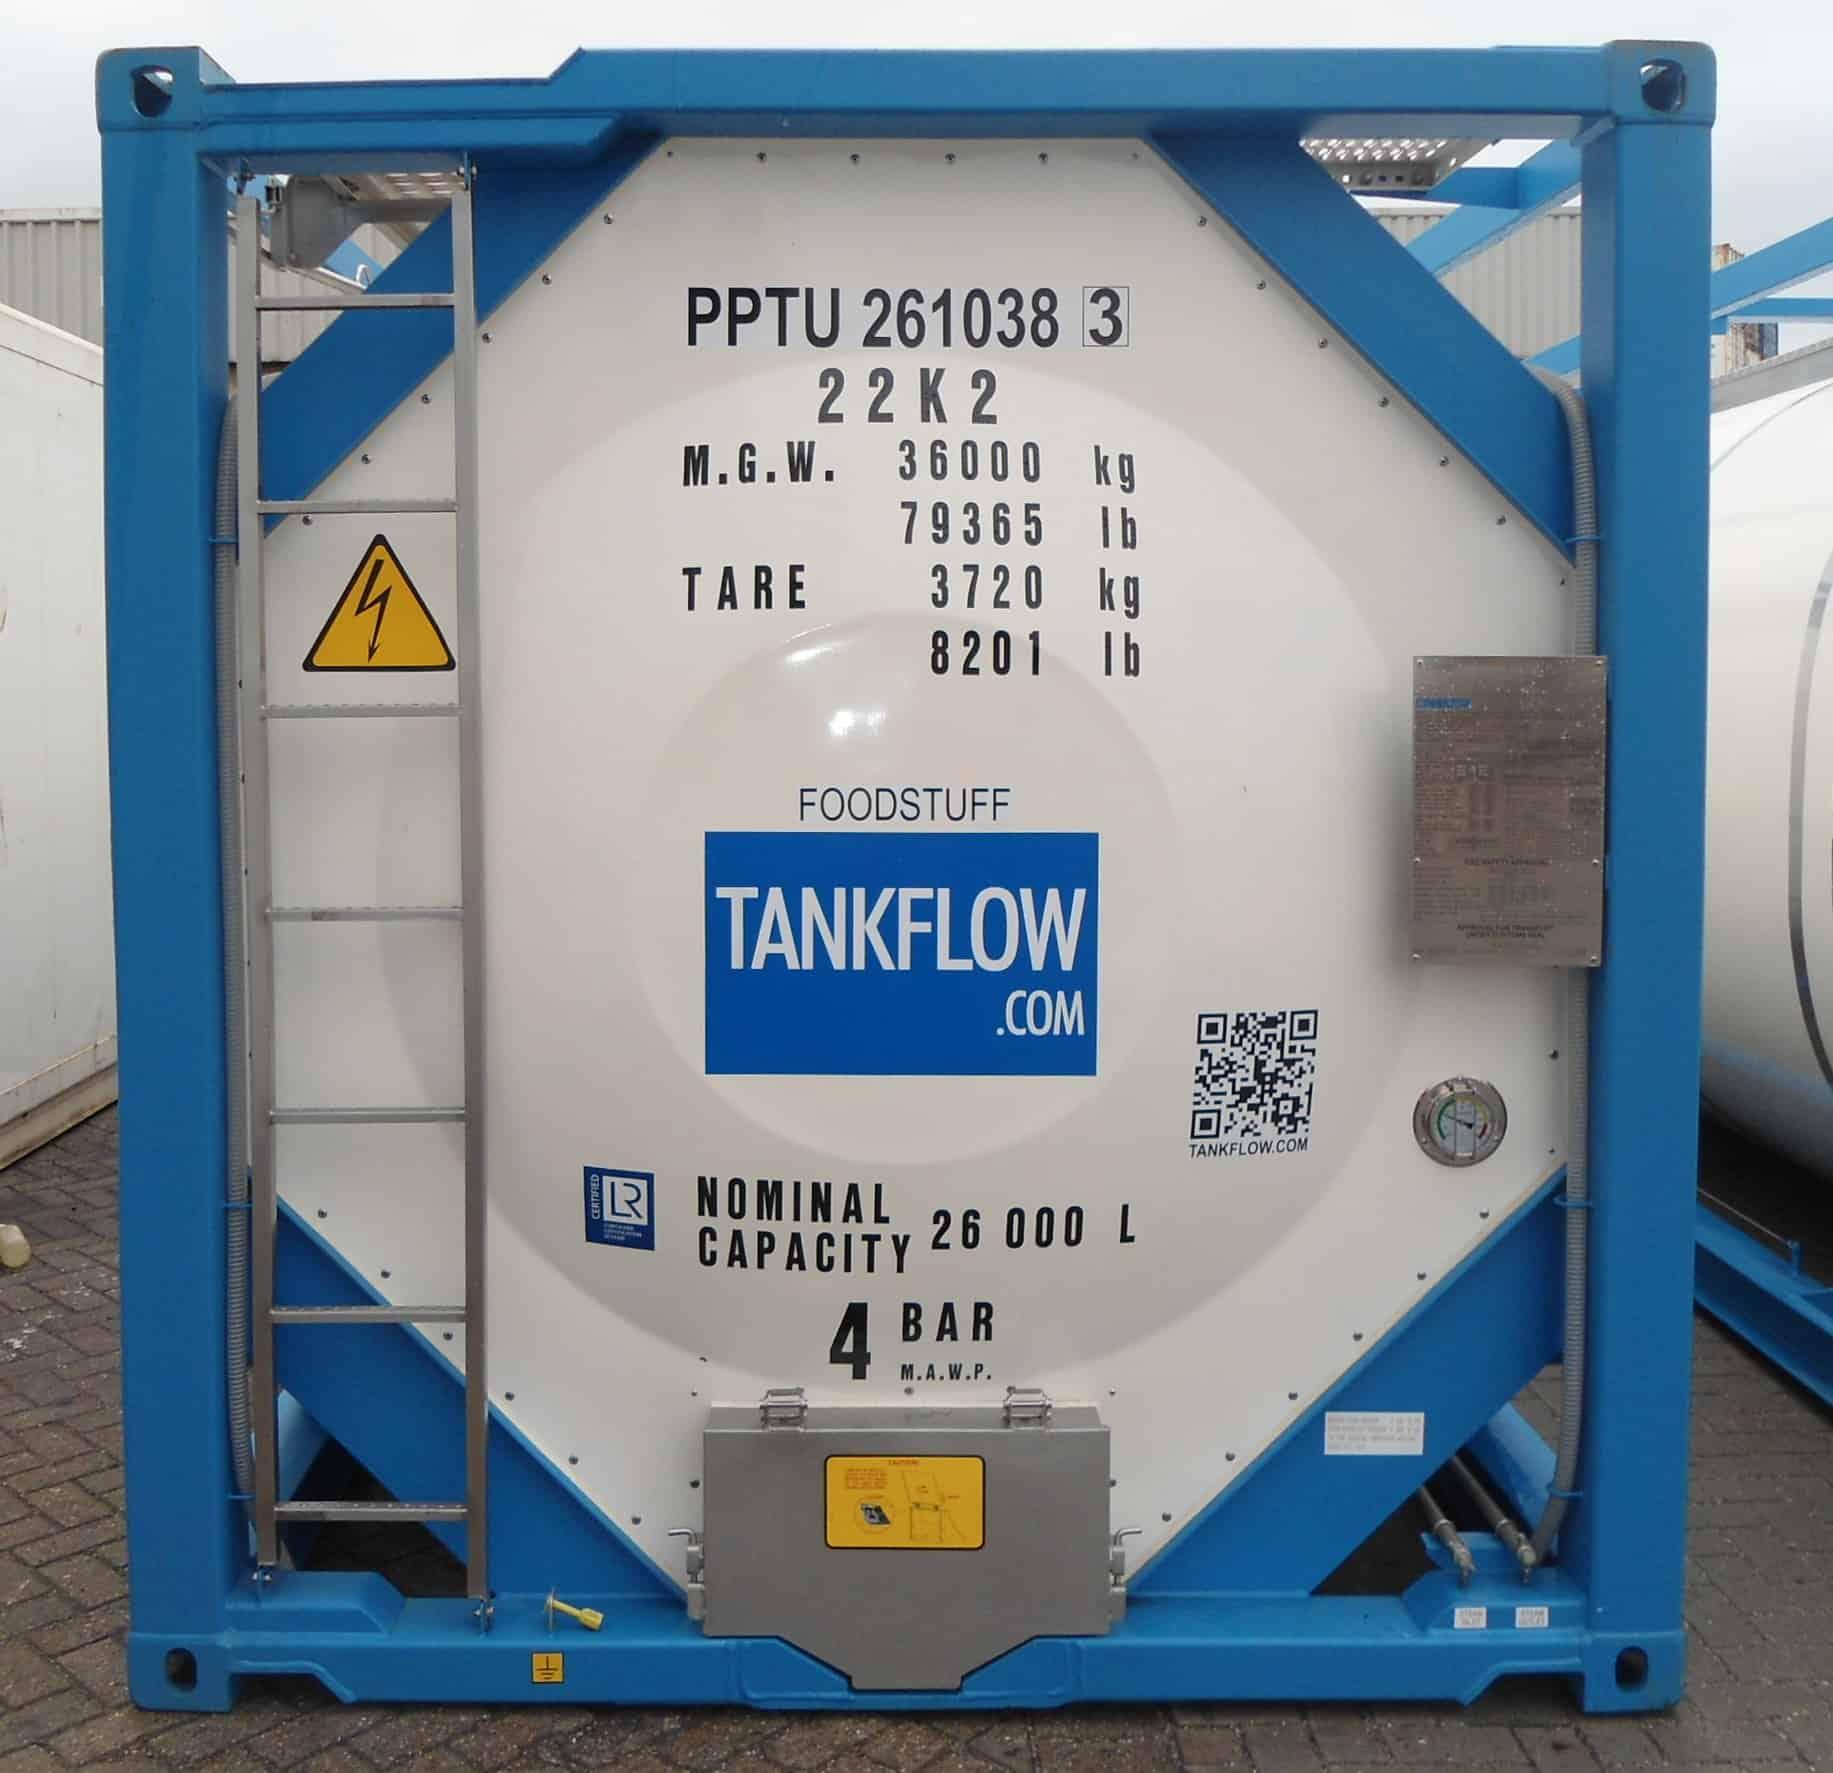 Tankflow-Container